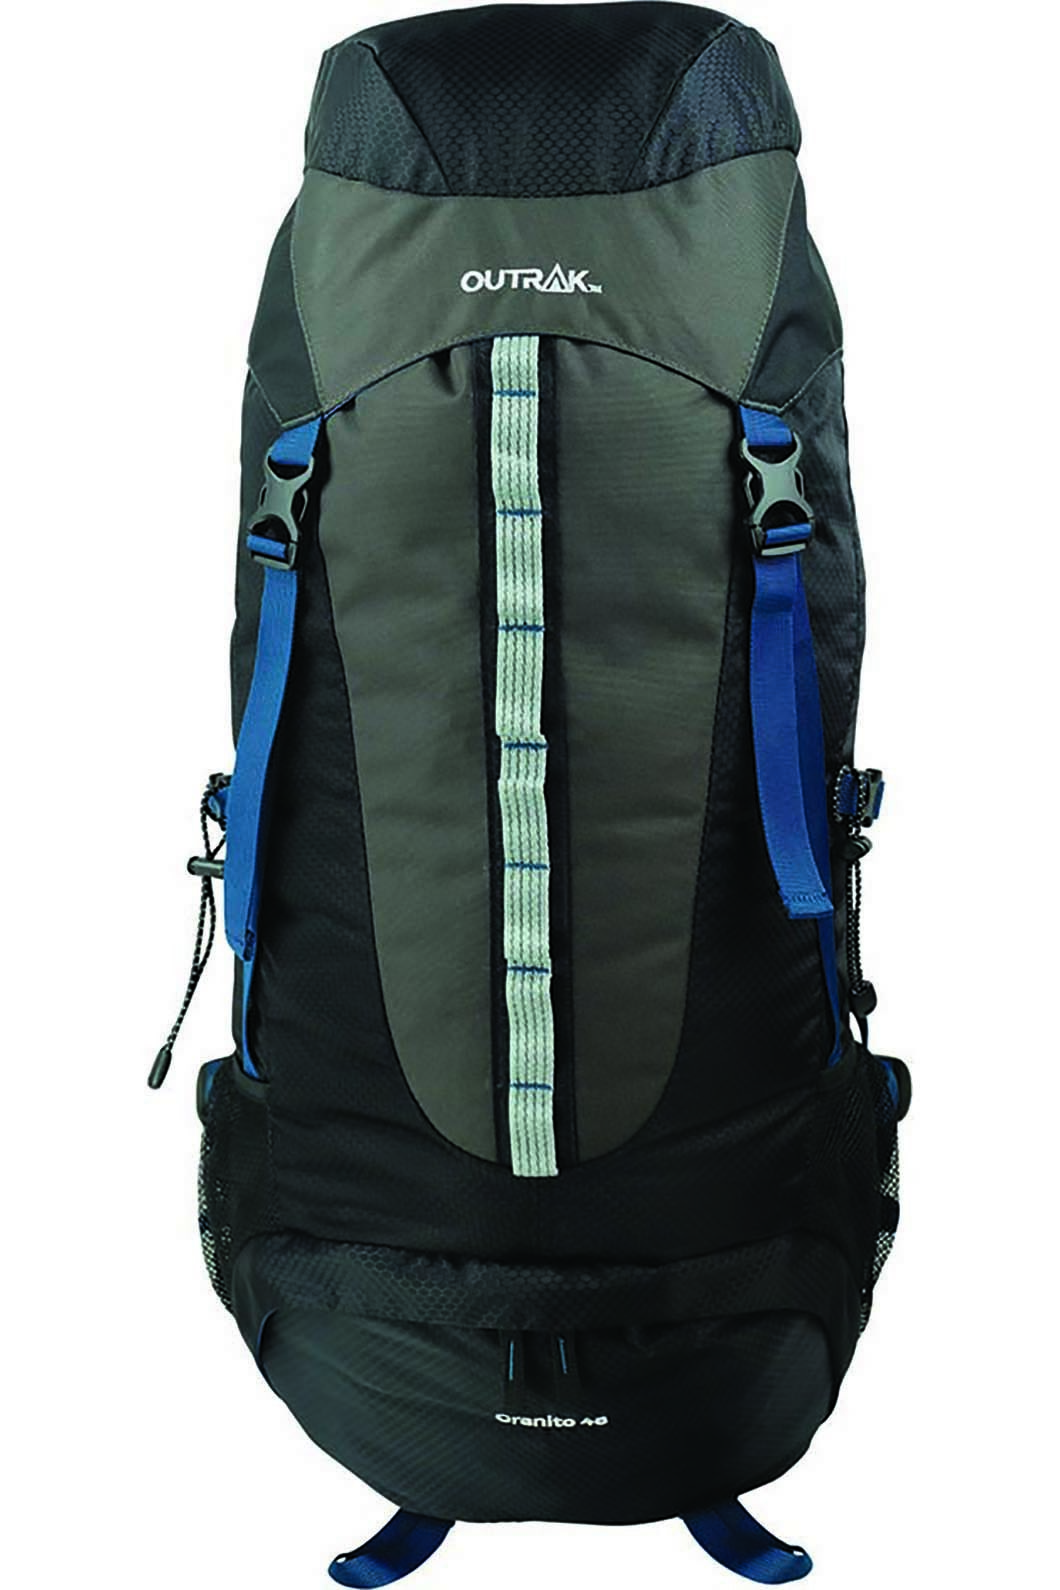 Outrak Granito Trekking Pack 48L8L, None, hi-res